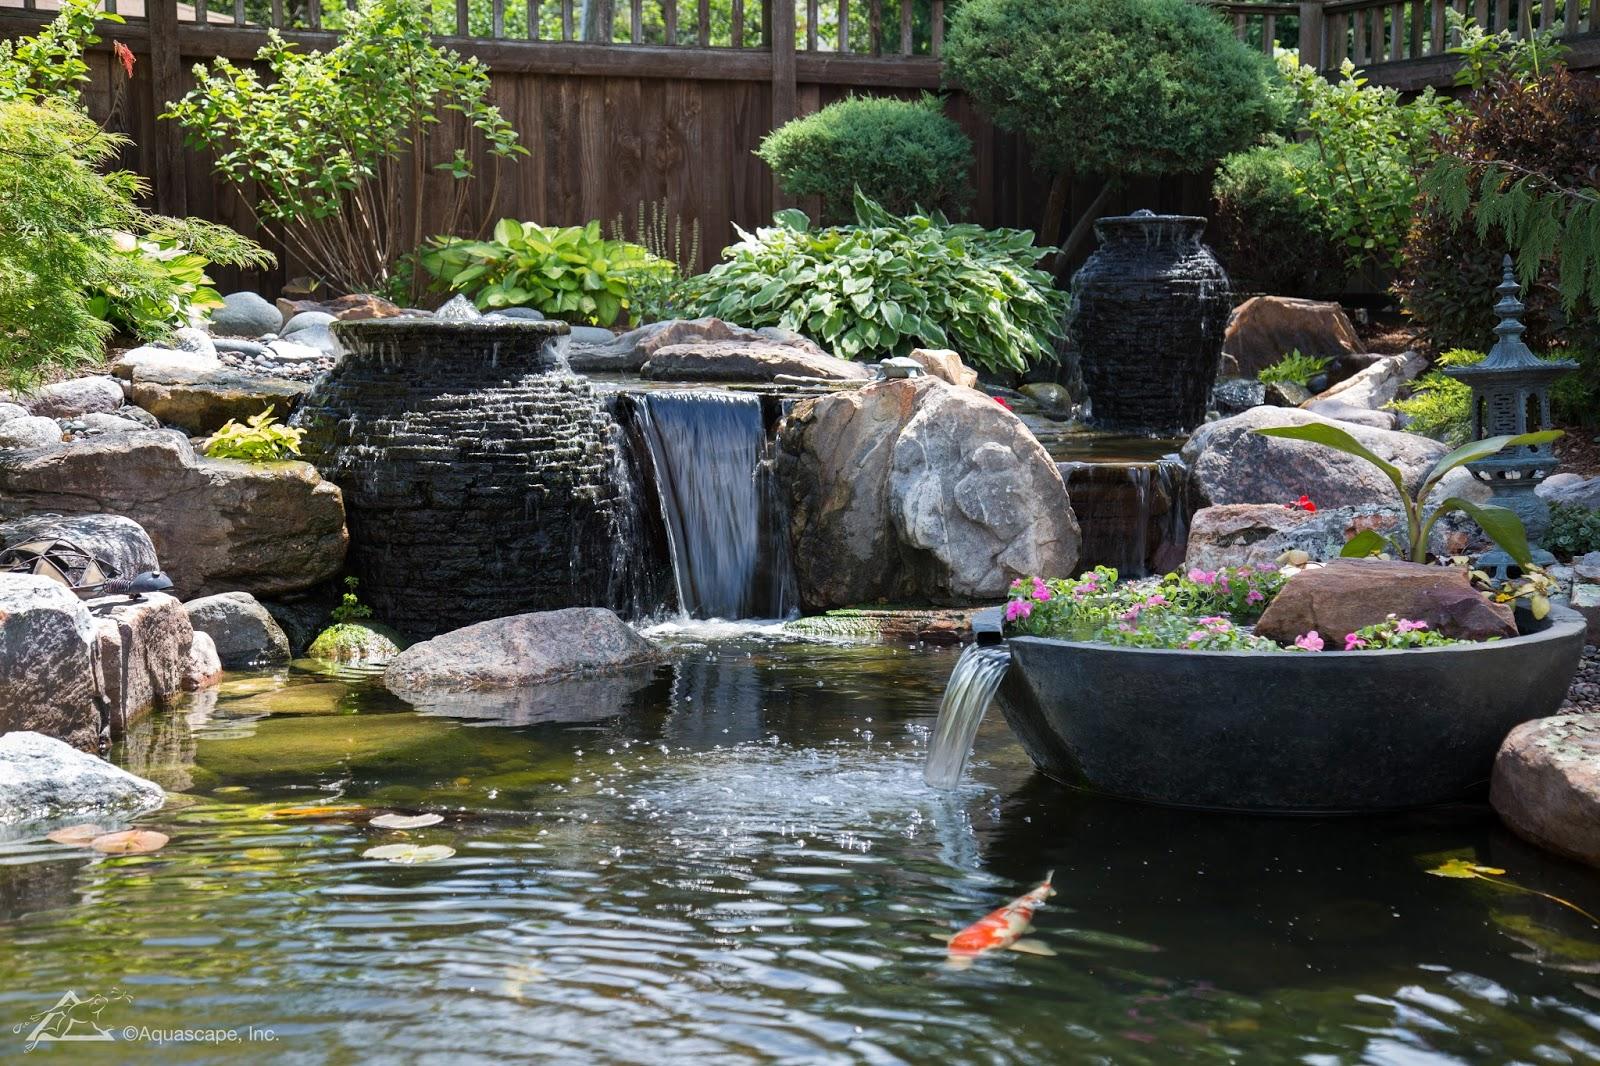 poseidon pond mann: how much does a backyard (koi/ecosystem